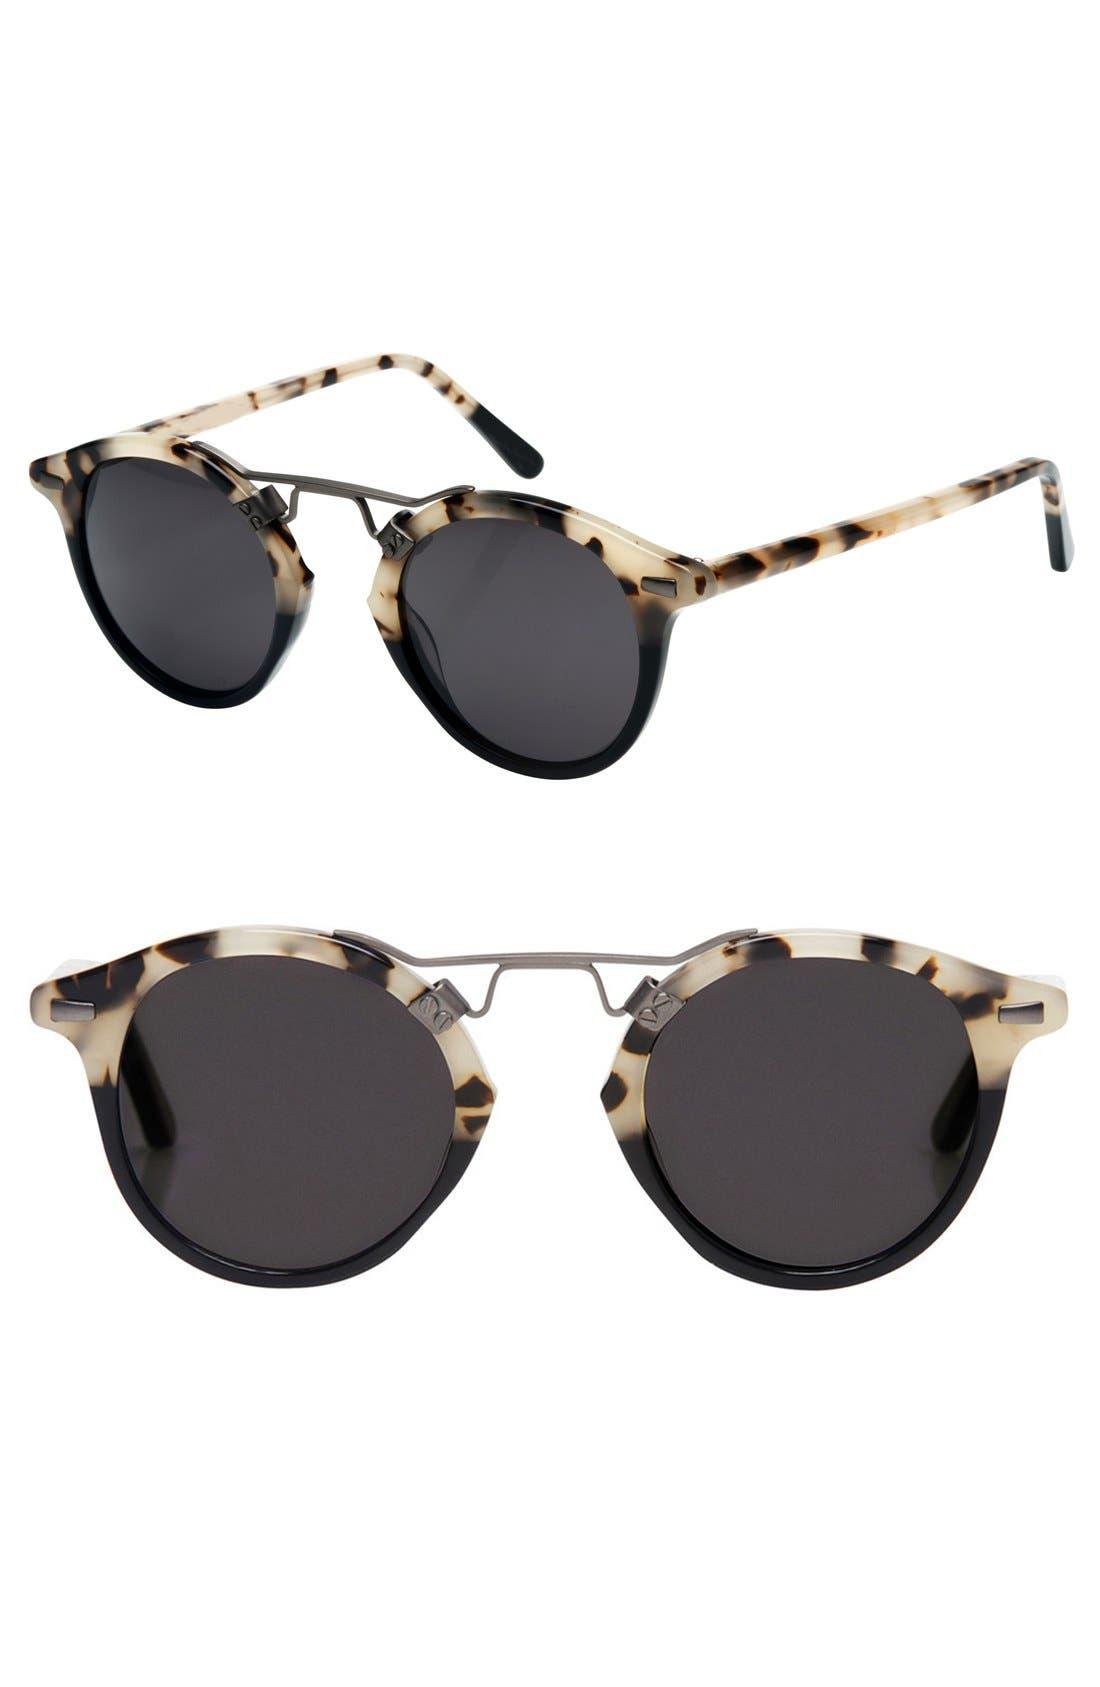 Main Image - KREWE 'St. Louis' 46mm Sunglasses